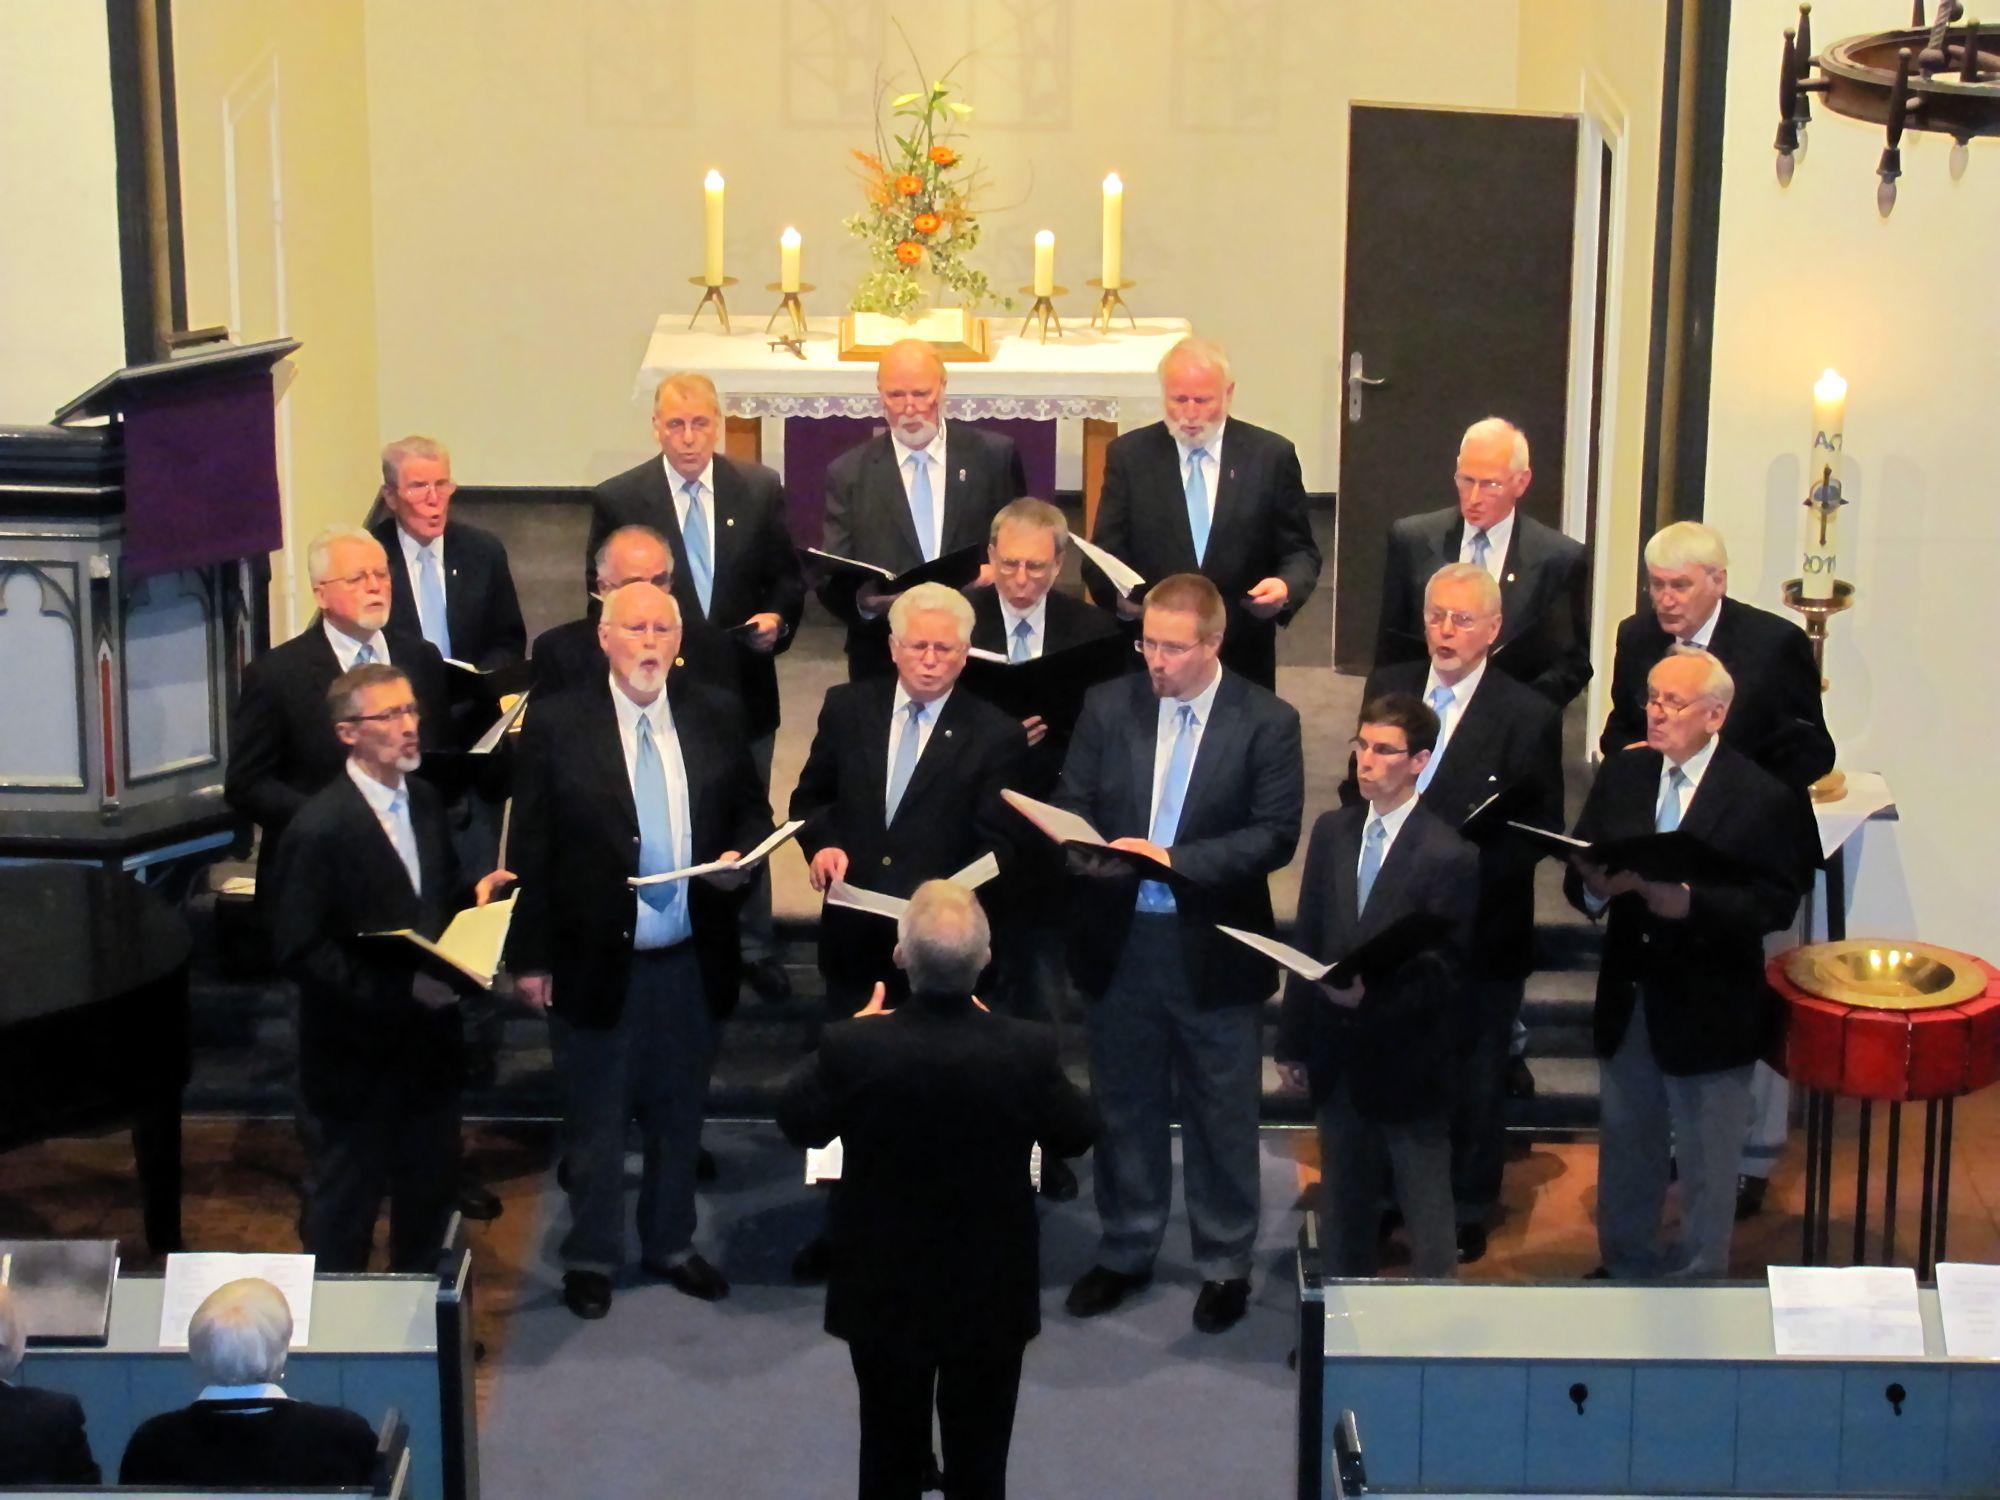 Kieler Kammerchor